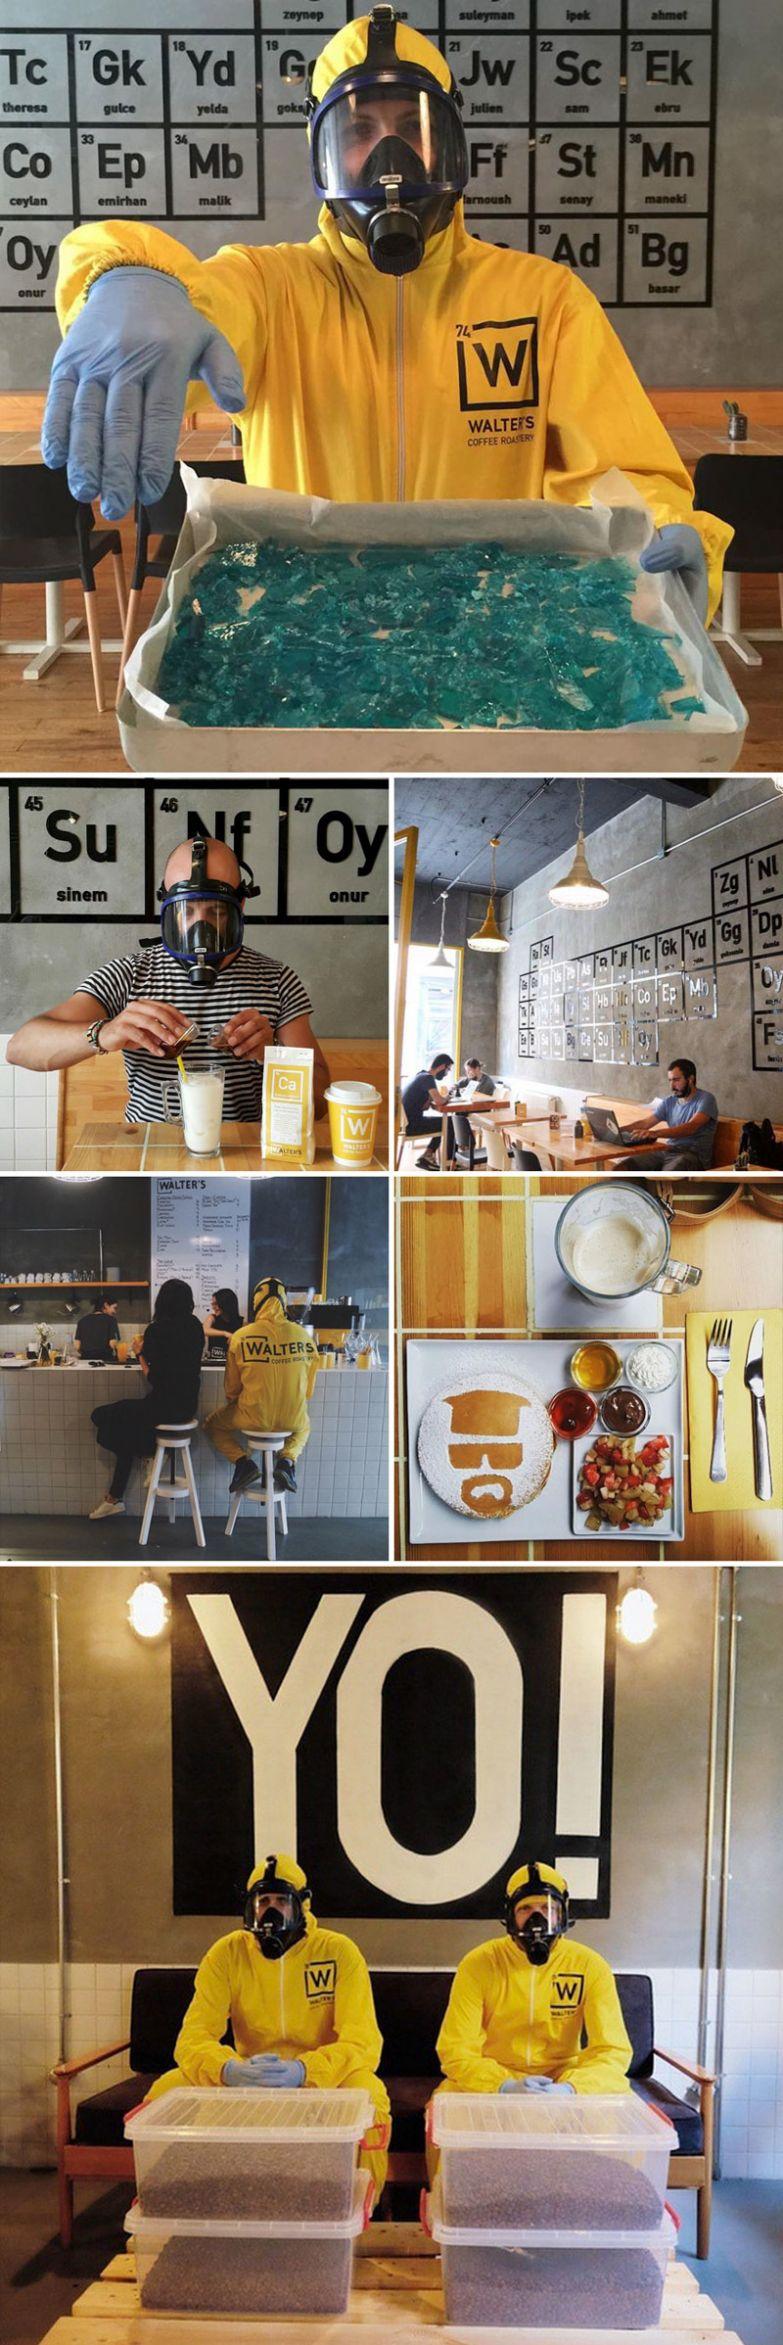 Лаборатория Уолтера, Walter's Coffee Roastery, Стамбул, Турция мир, подборка, ресторан